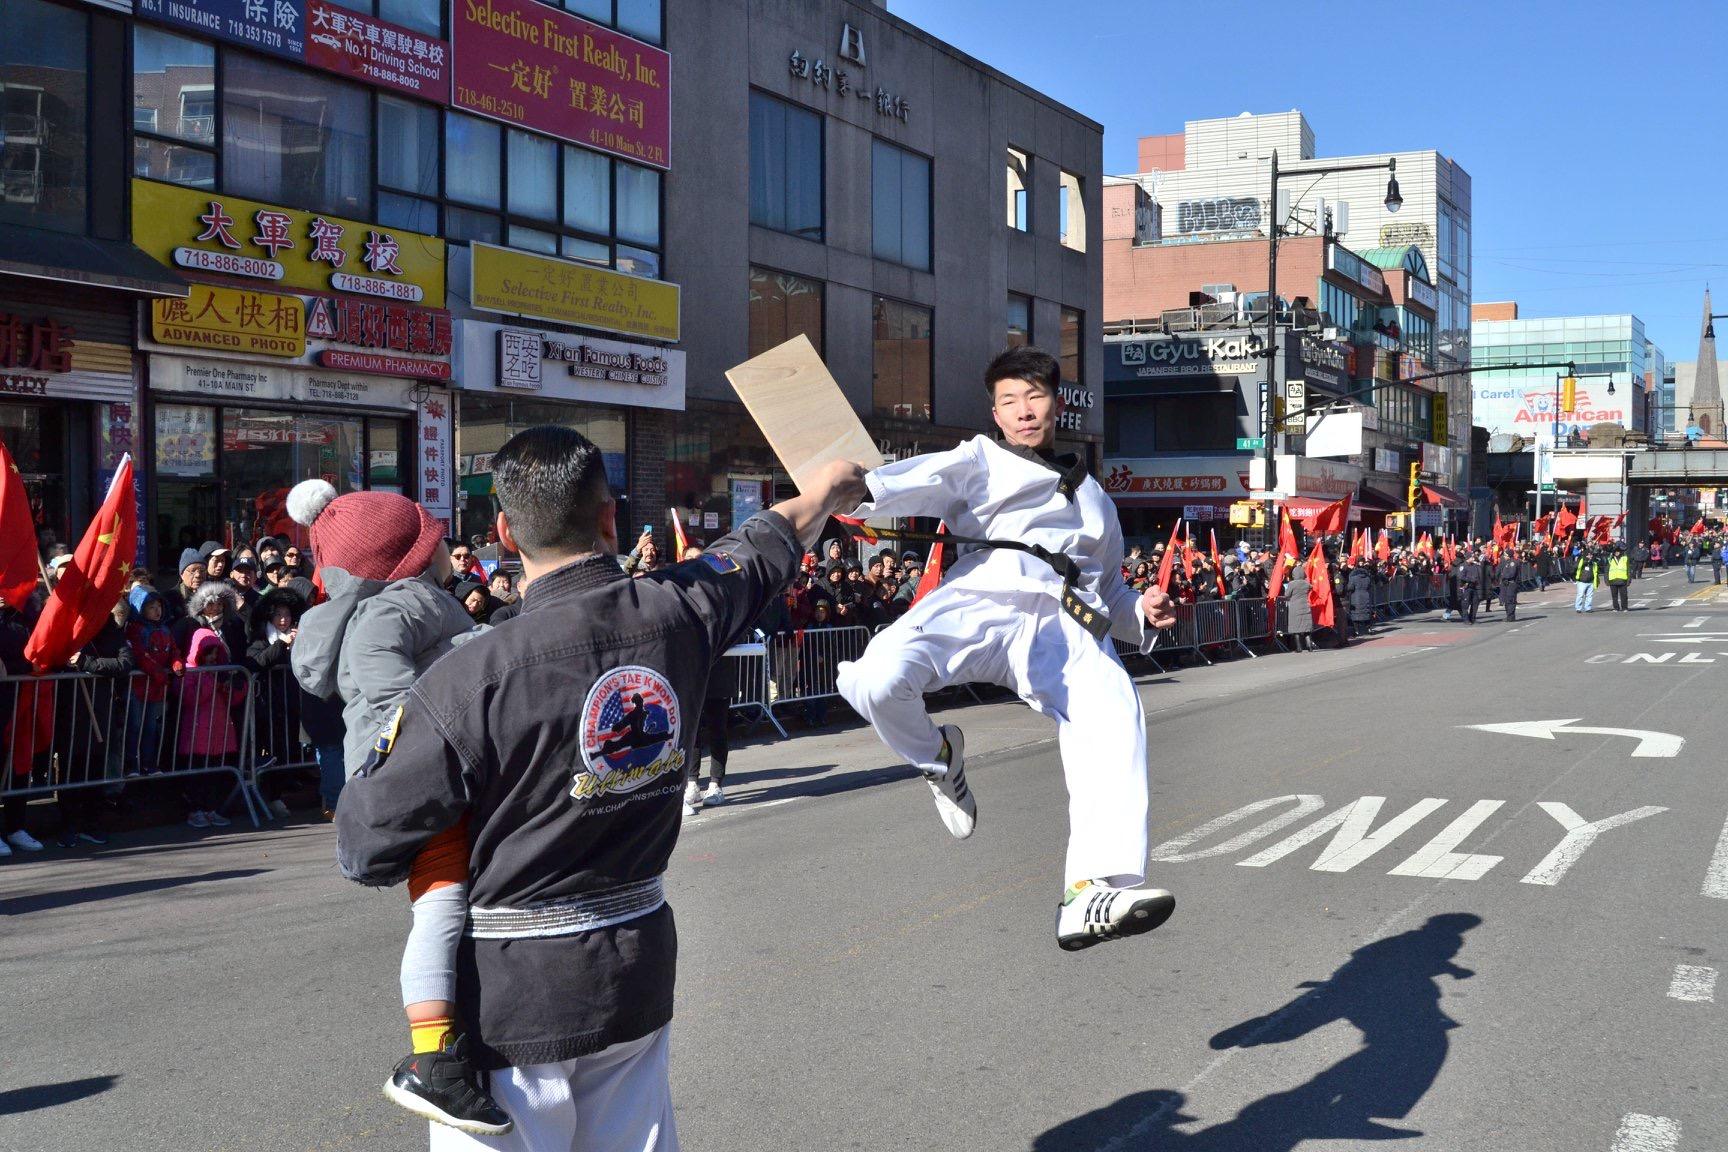 An Ultimate Champions Taekwondo student performs at Flushing's Lunar New Year Parade. Photo courtesy of Ultimate Champions Taekwondo